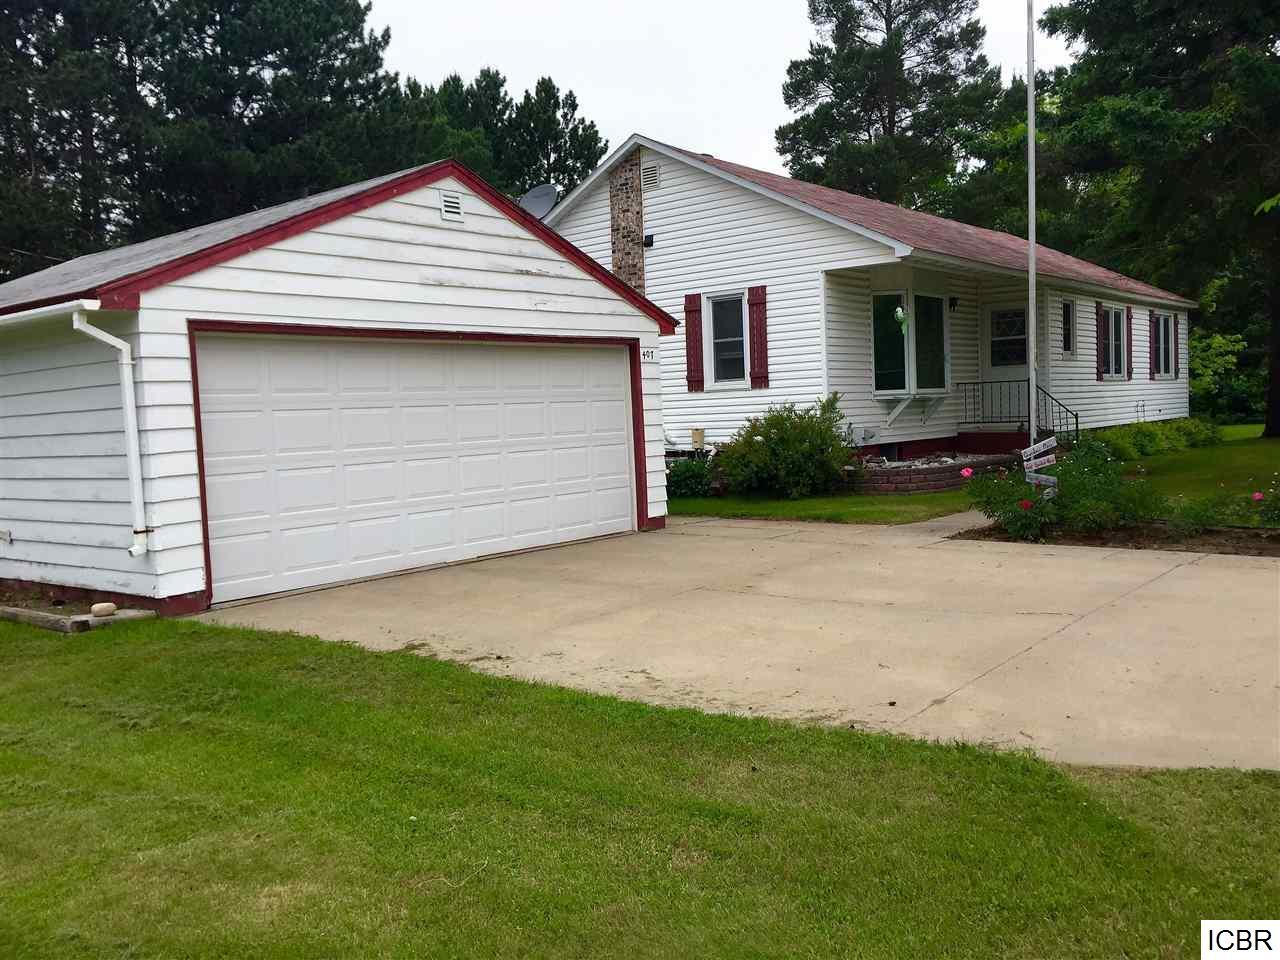 407 La Prairie Ave, Grand Rapids Township, MN 55744